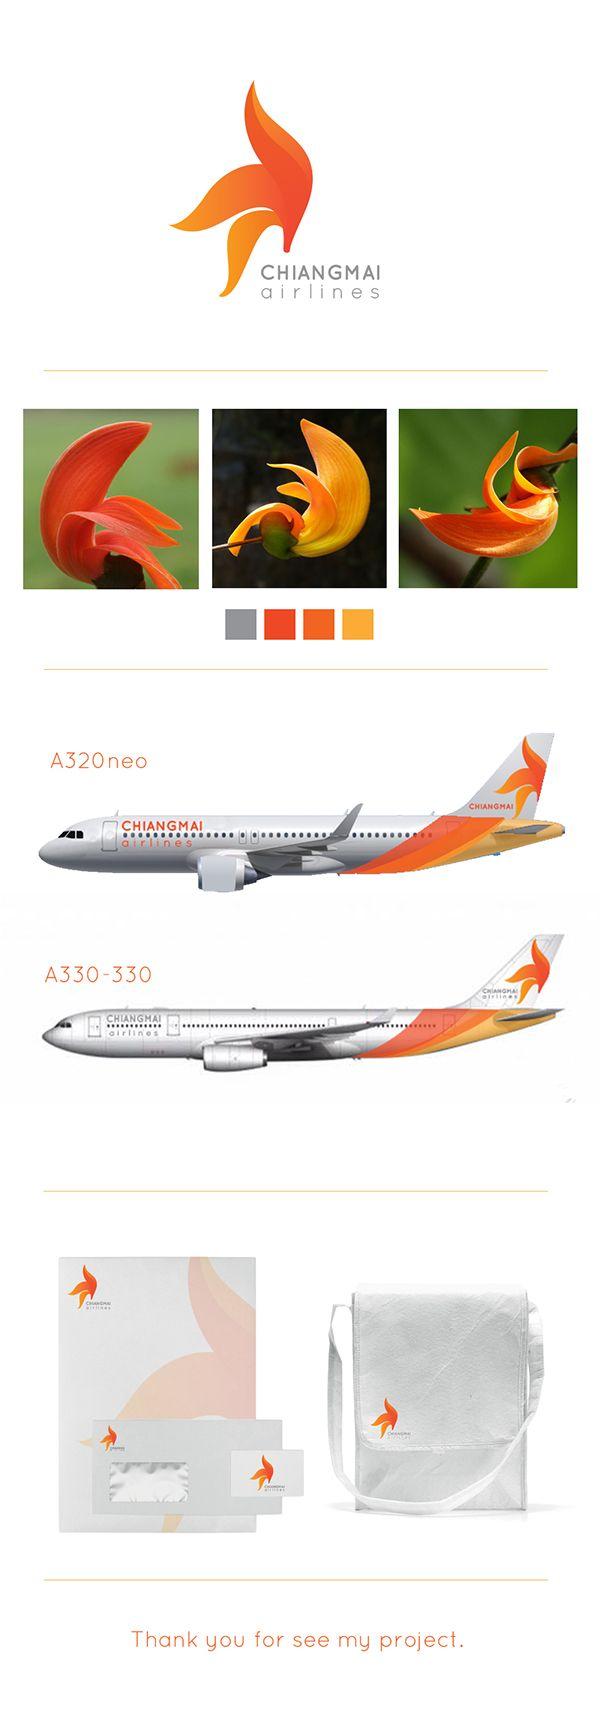 logo design : Chiangmai airlines on Behance #toonzidesign #logo #thailand…